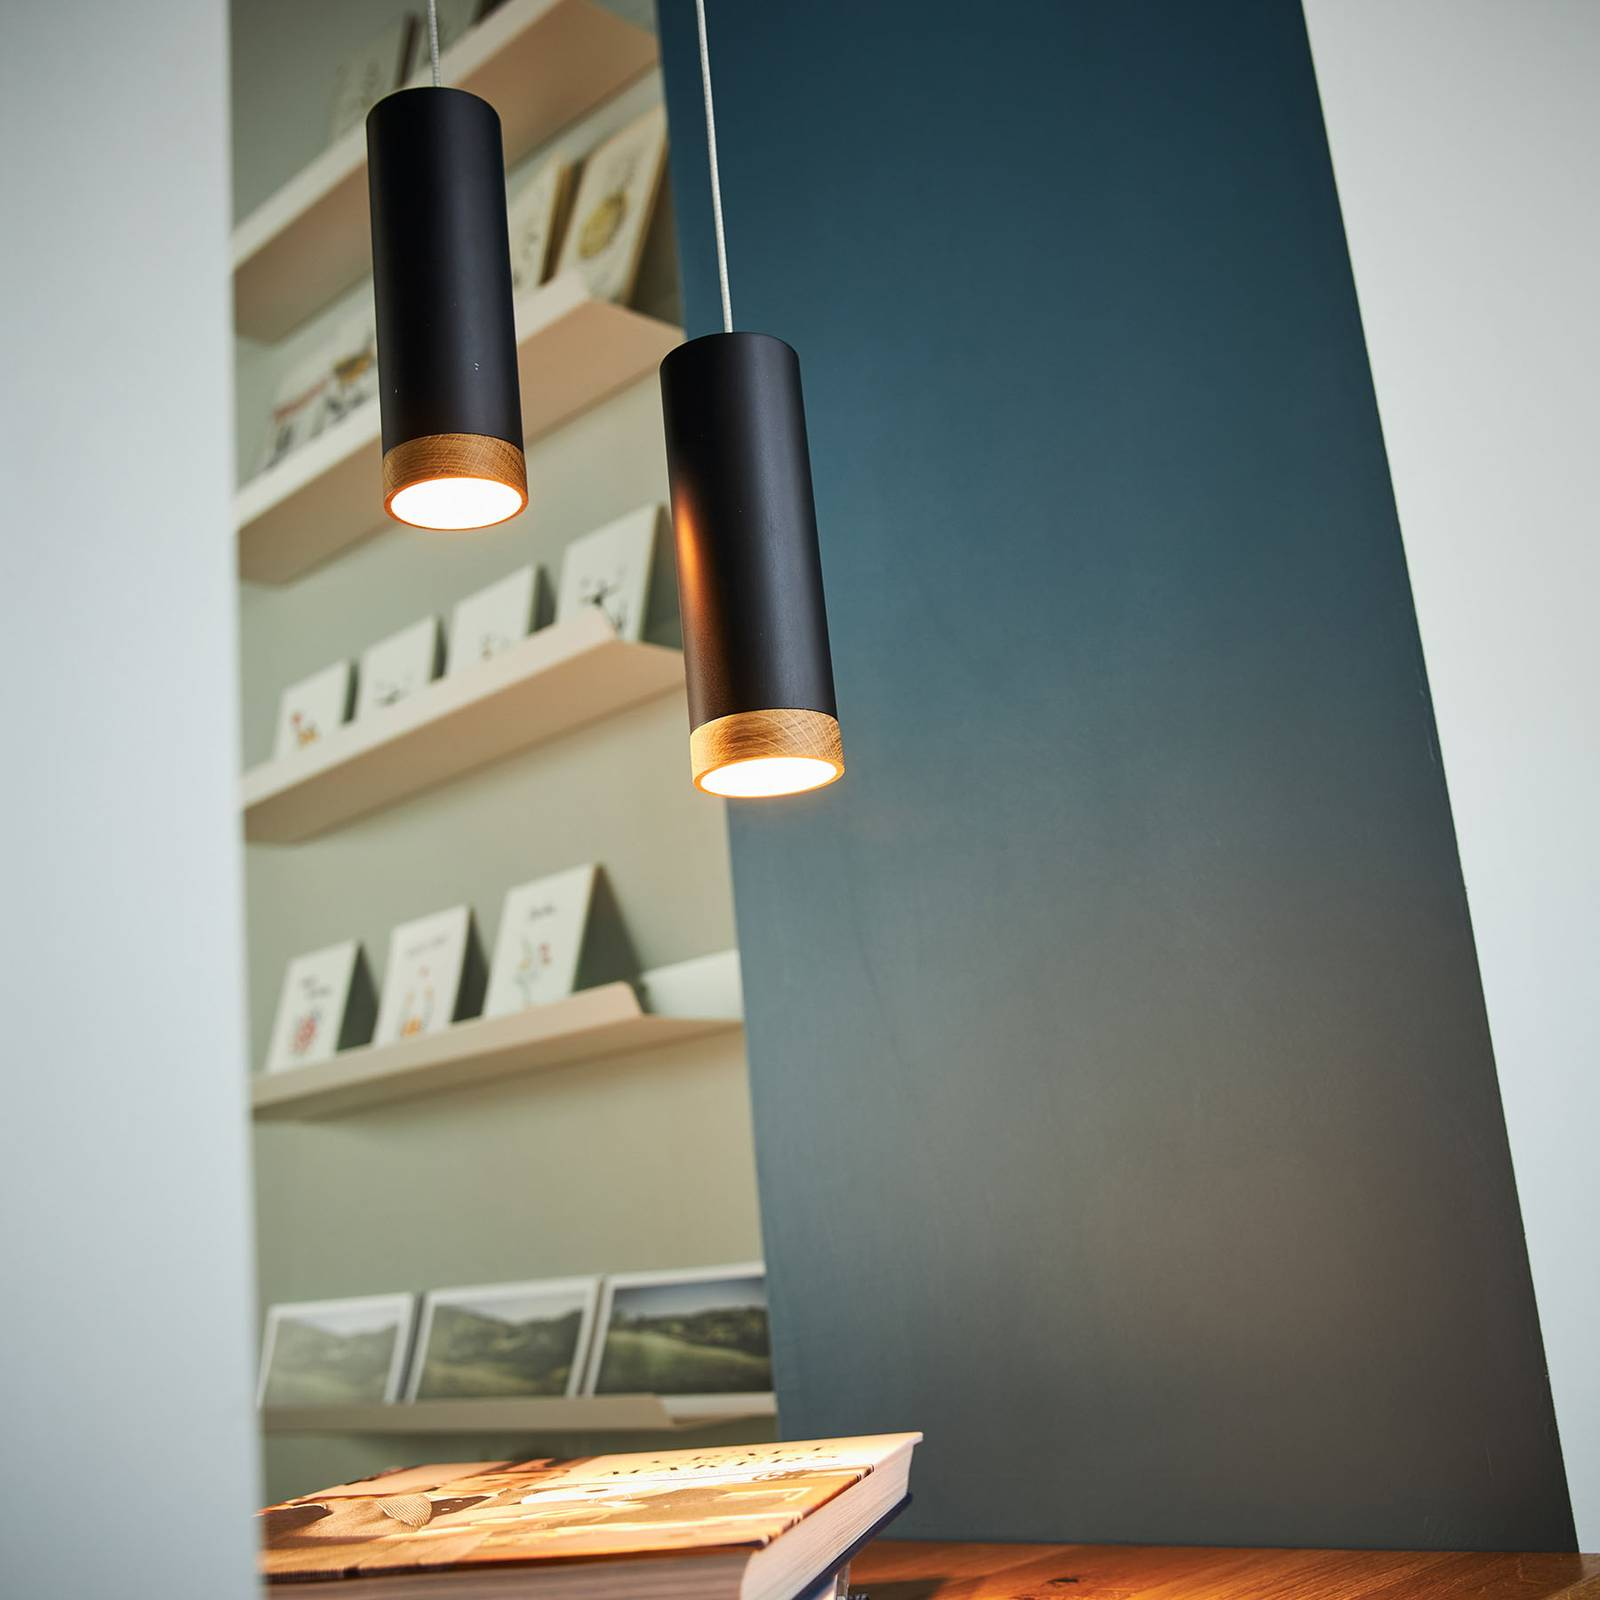 LED-riippuvalaisin PHEB, musta/tammi